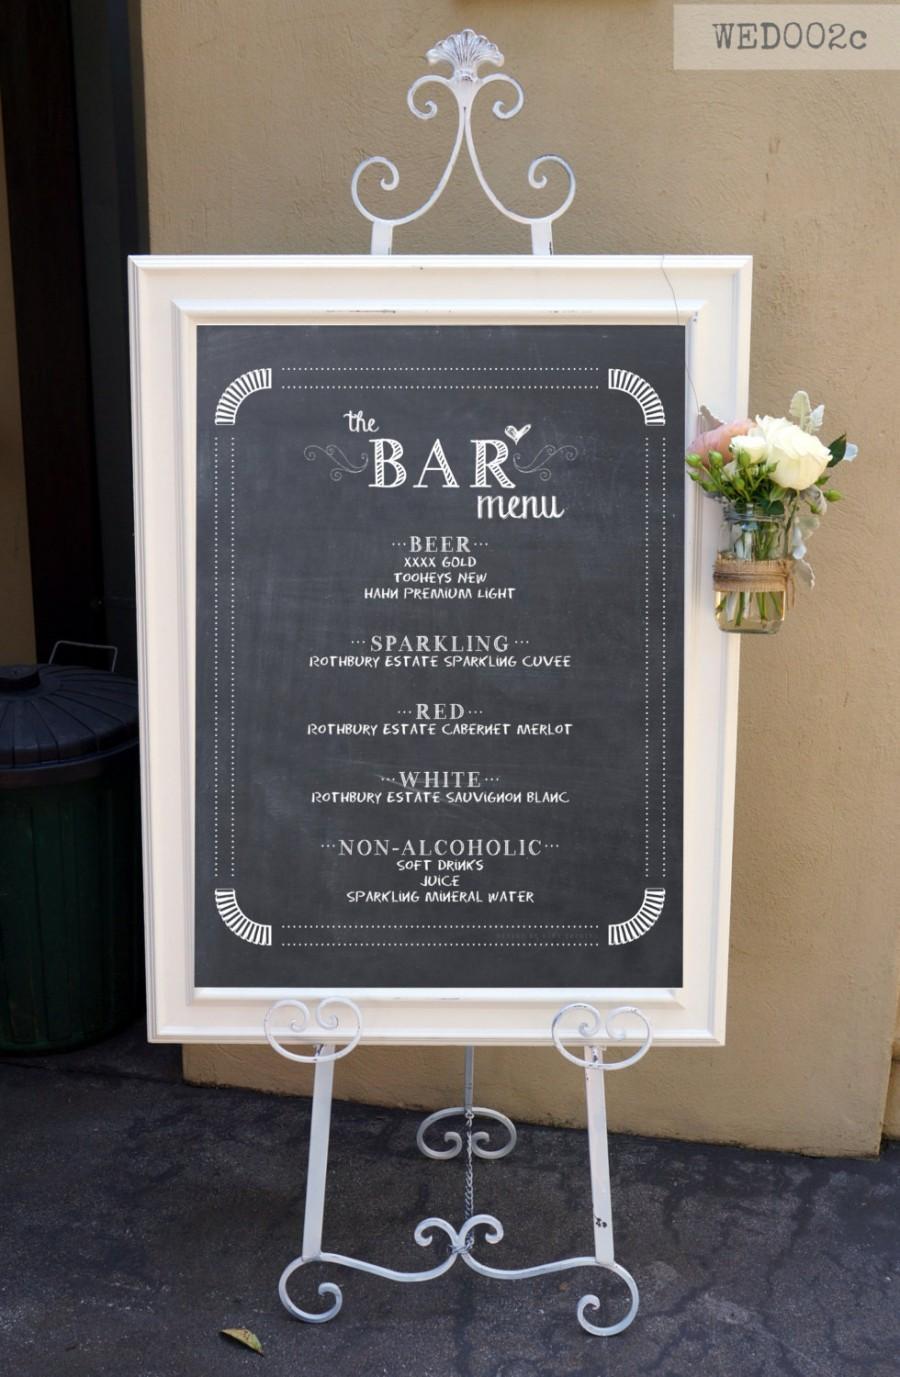 Mariage - Bar Menu / Wedding Bar Sign / Cocktail Signature Drinks Menu / Chalkboard Bar Poster by Mint Imprint / CUSTOMISED Printable Wedding Sign